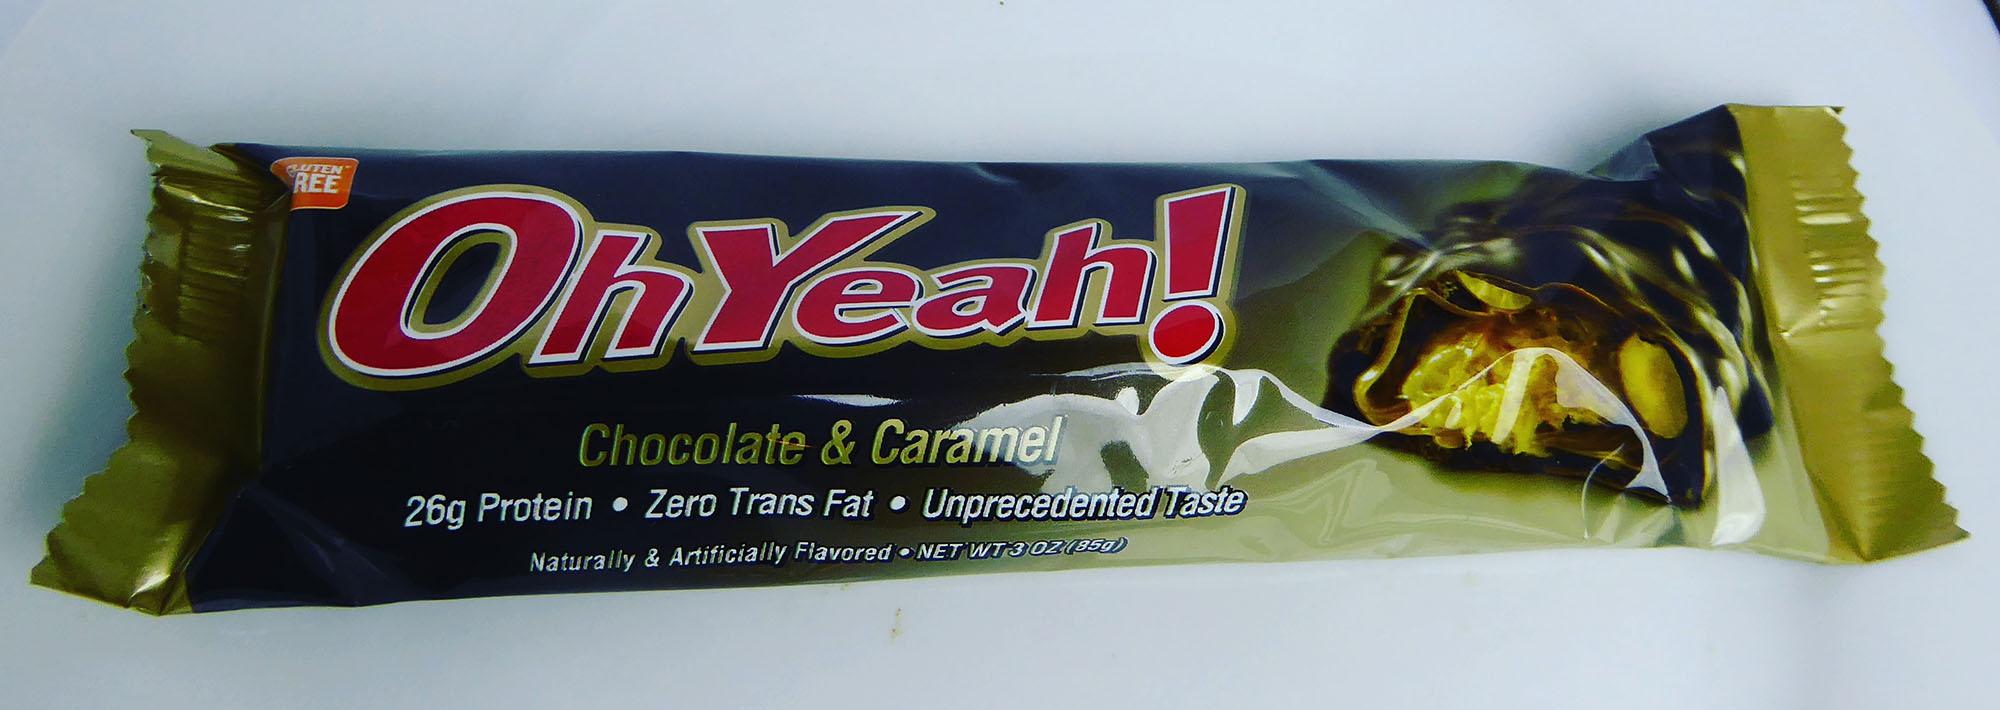 OhYeah! Protein Bar Chocolate Caramel Schokolade Proteinriegel Eiweißriegel